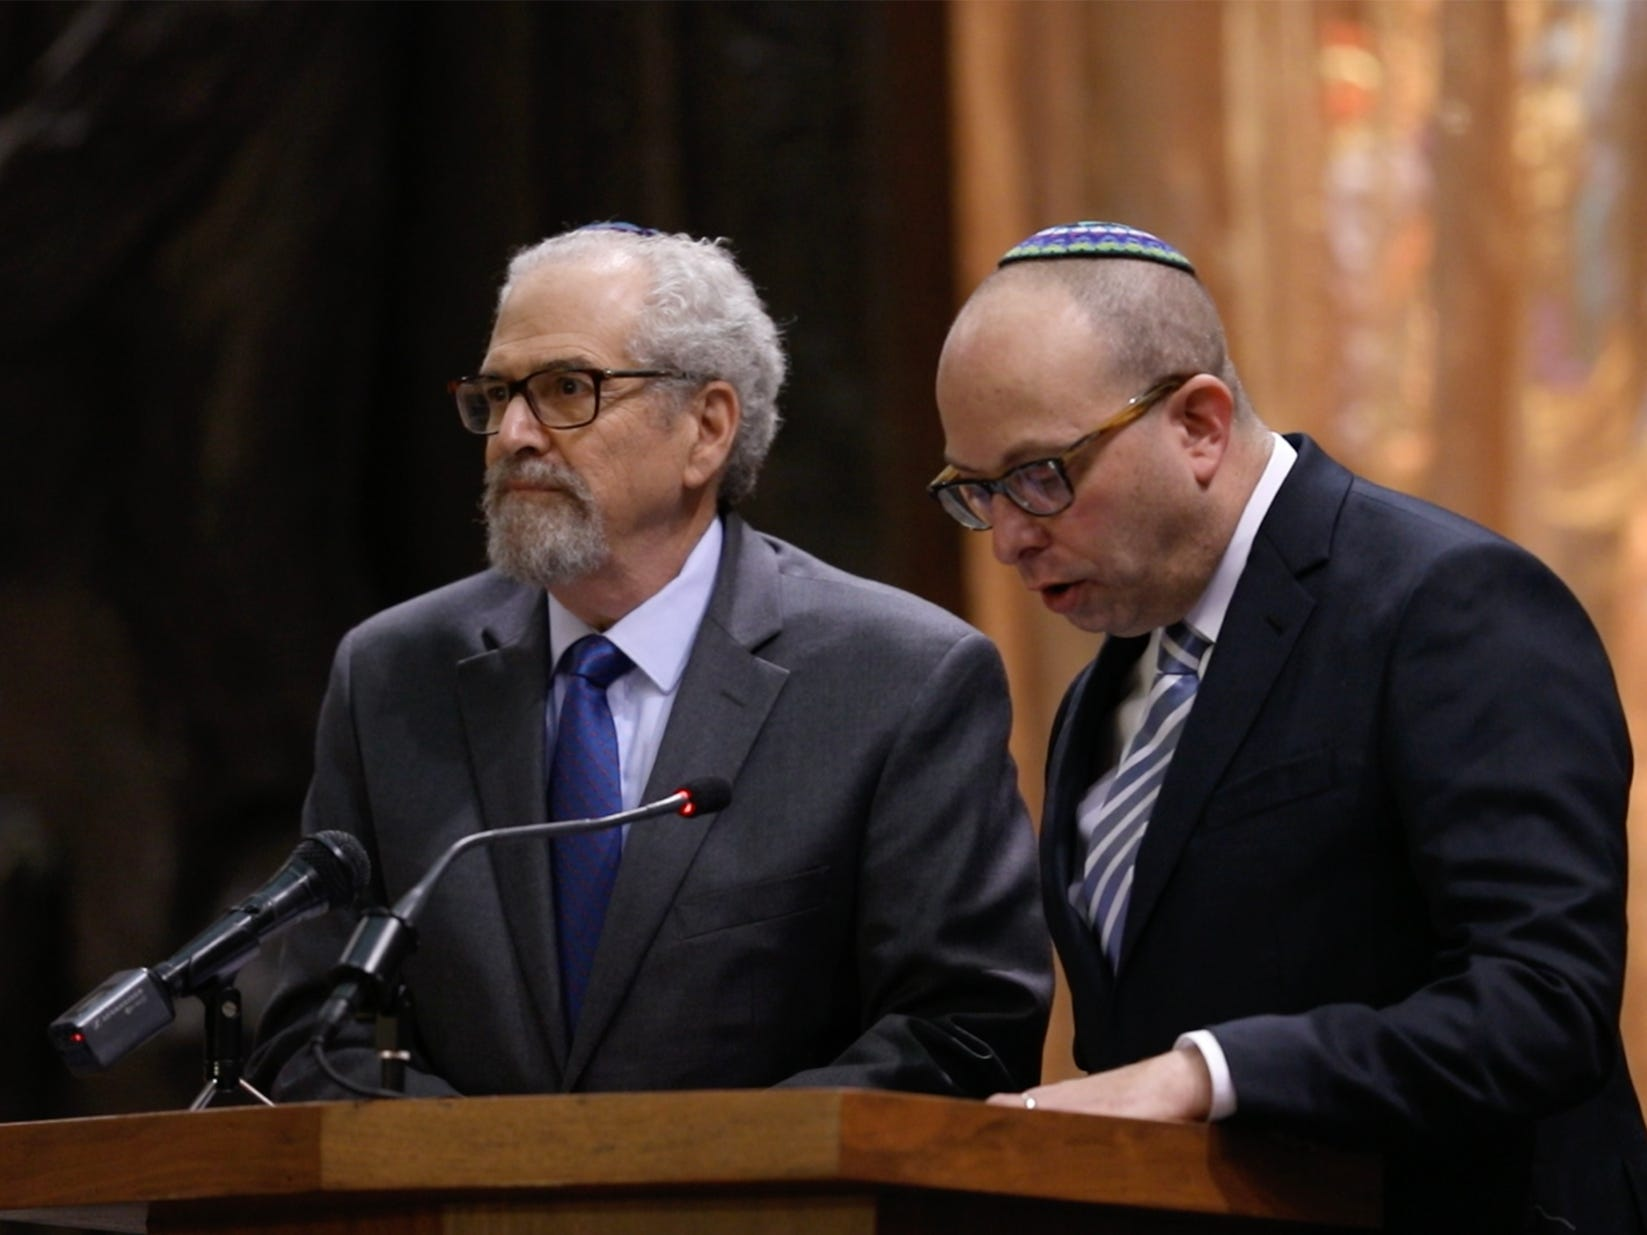 Rabbi Alan Katz with Temple Sinai and Rabbi Michael Silbert with Temple Beth David read from Psalms.